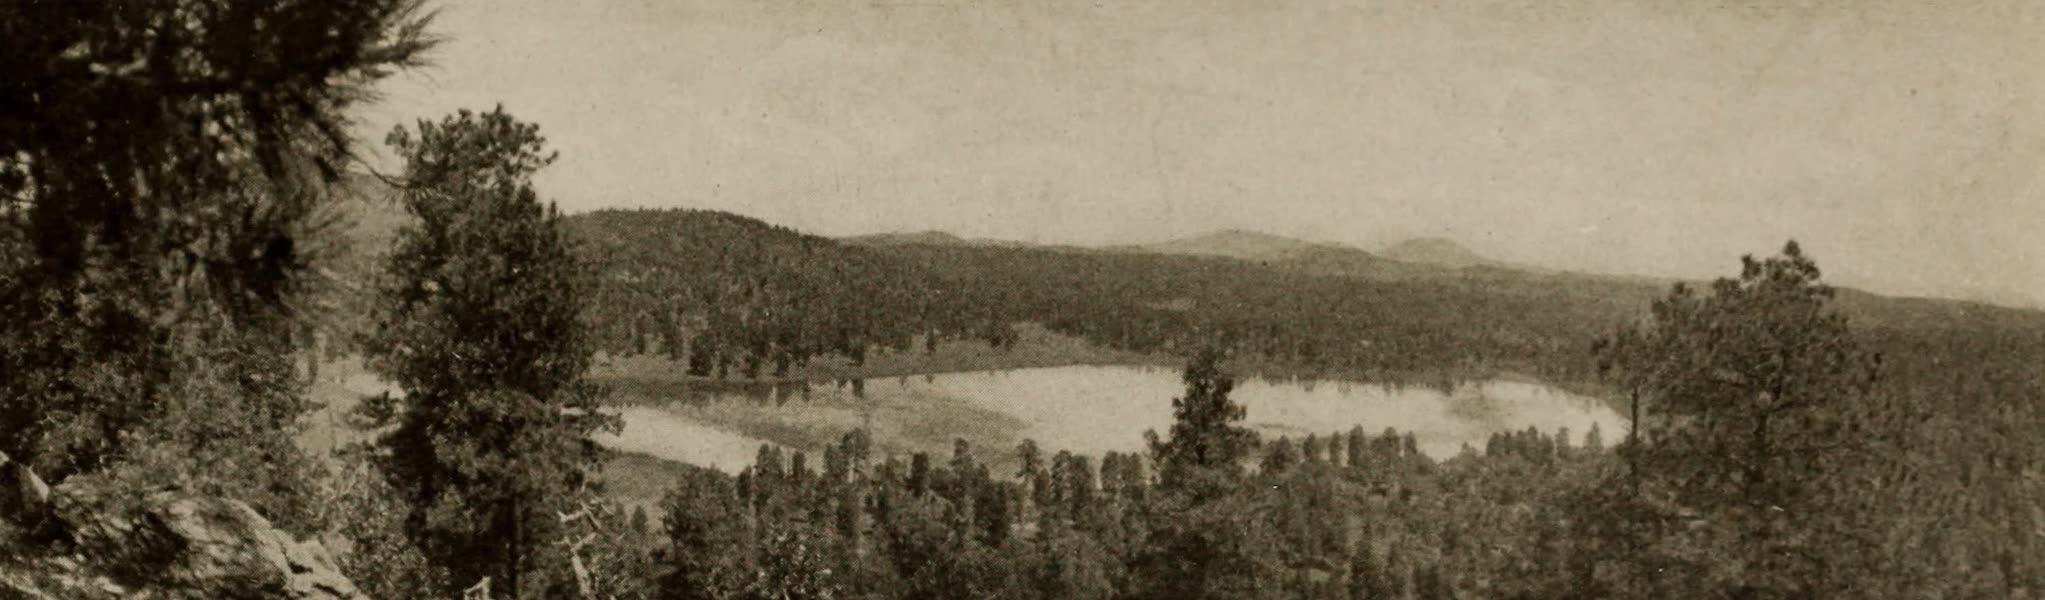 Arizona, The Wonderland - Coleman Lake, near Williams, Arizona (1917)